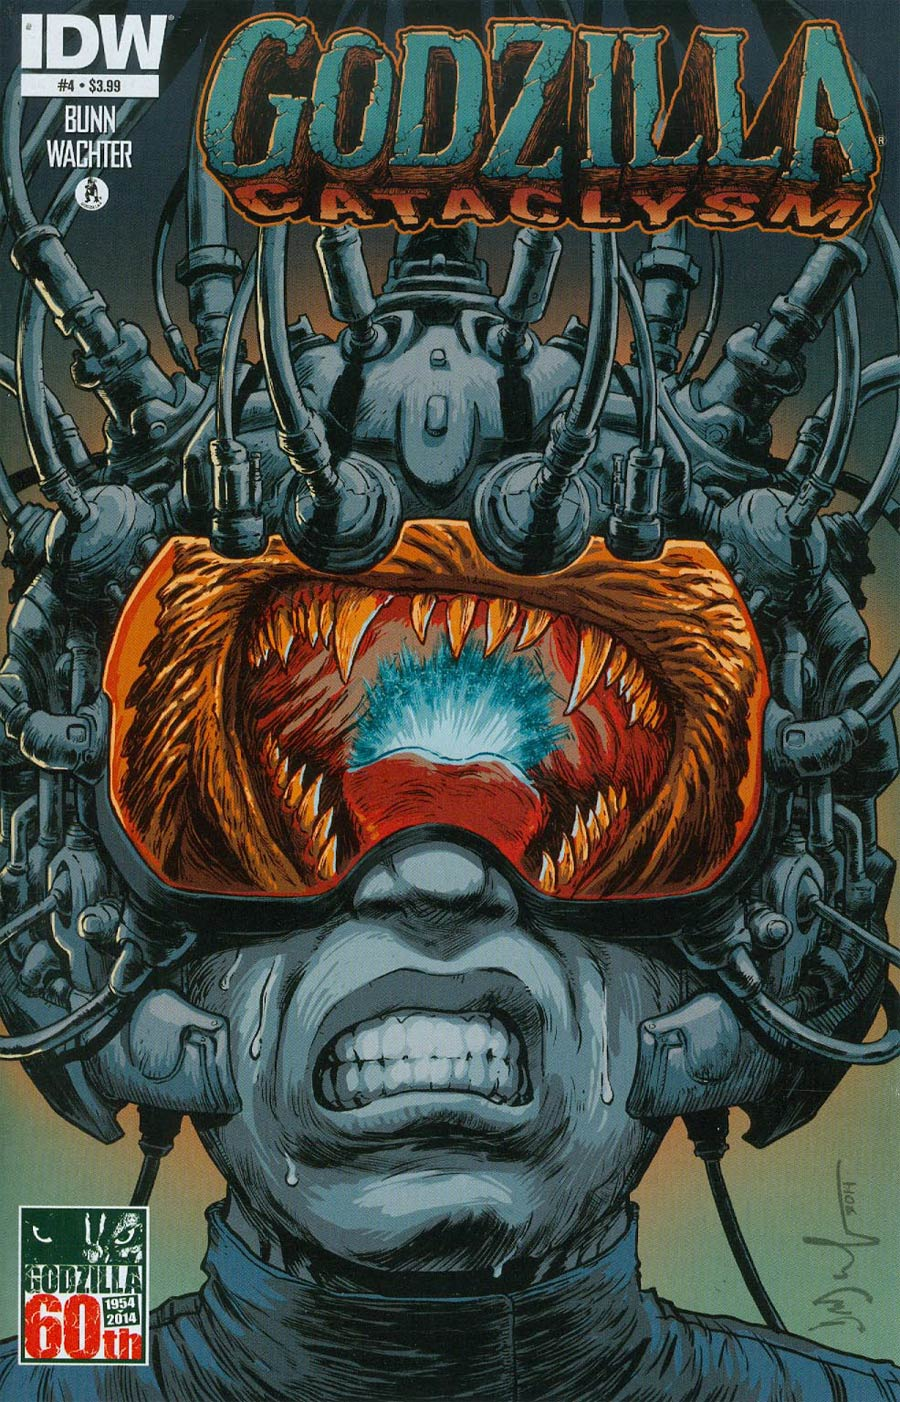 Godzilla Cataclysm #4 Cover A Regular Dave Wachter Cover